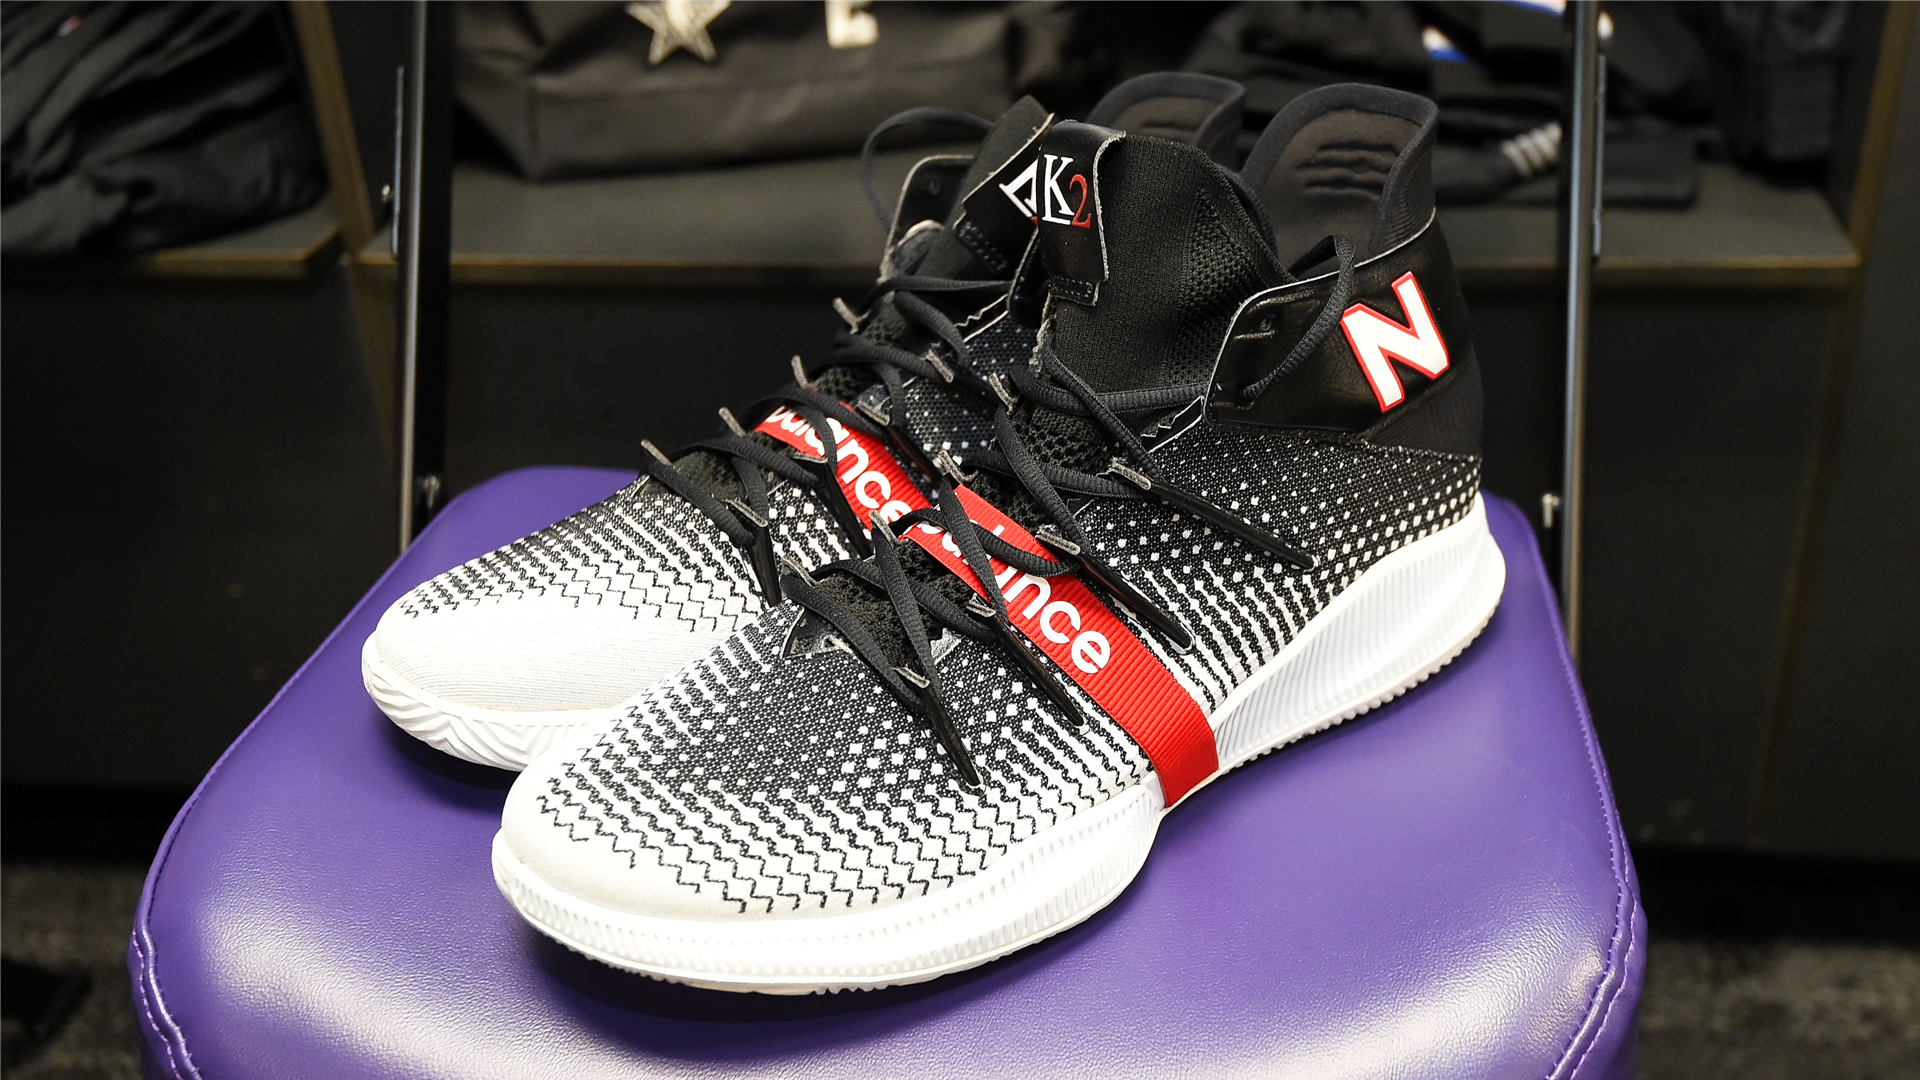 NBA All-Star 2019: Every sneaker worn